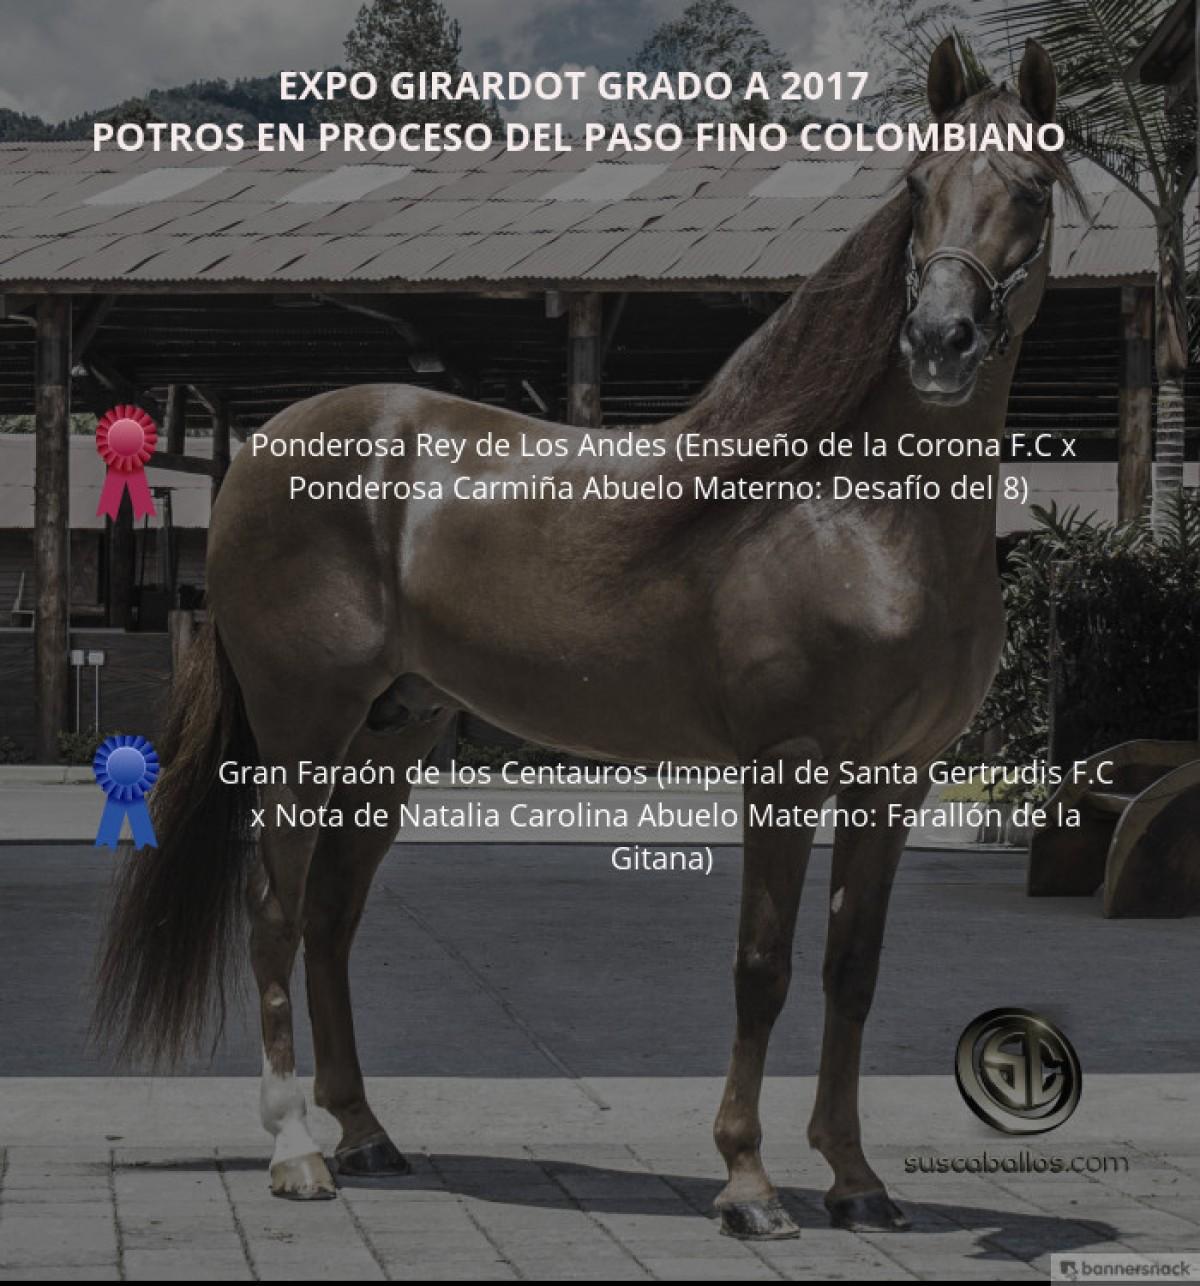 VÍDEO: Ponderosa Rey Mejor, Gran Faraón 1P, Potros Paso Fino, Expo Girardot 2017